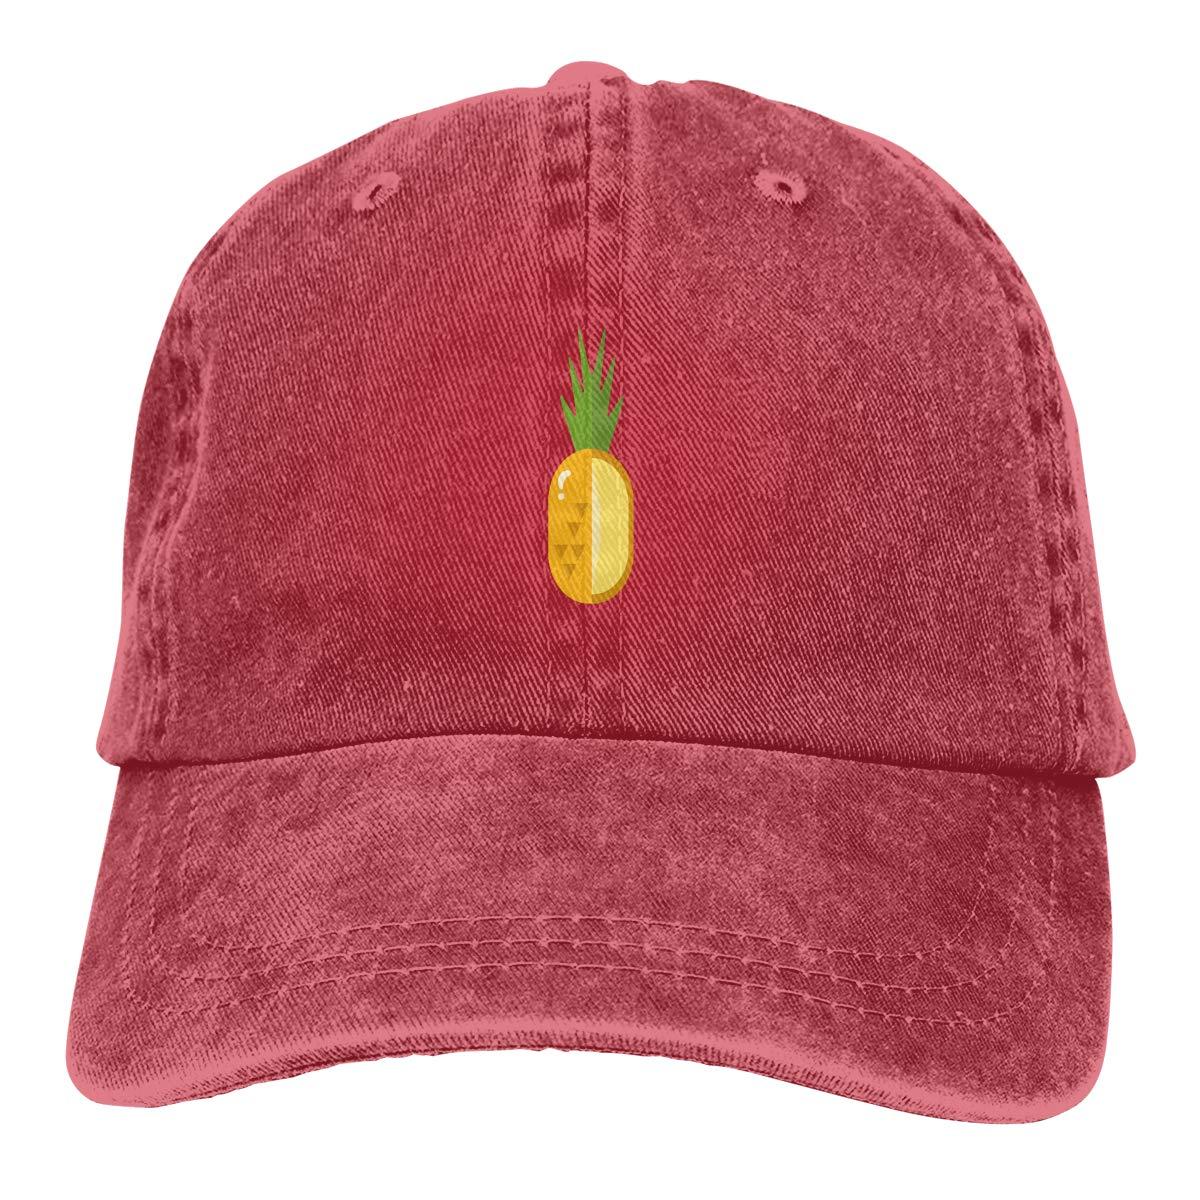 Pineapple Decoration Beautiful Cowboy Hat Dad Hats Trucker Denim Cap for Mens Womens